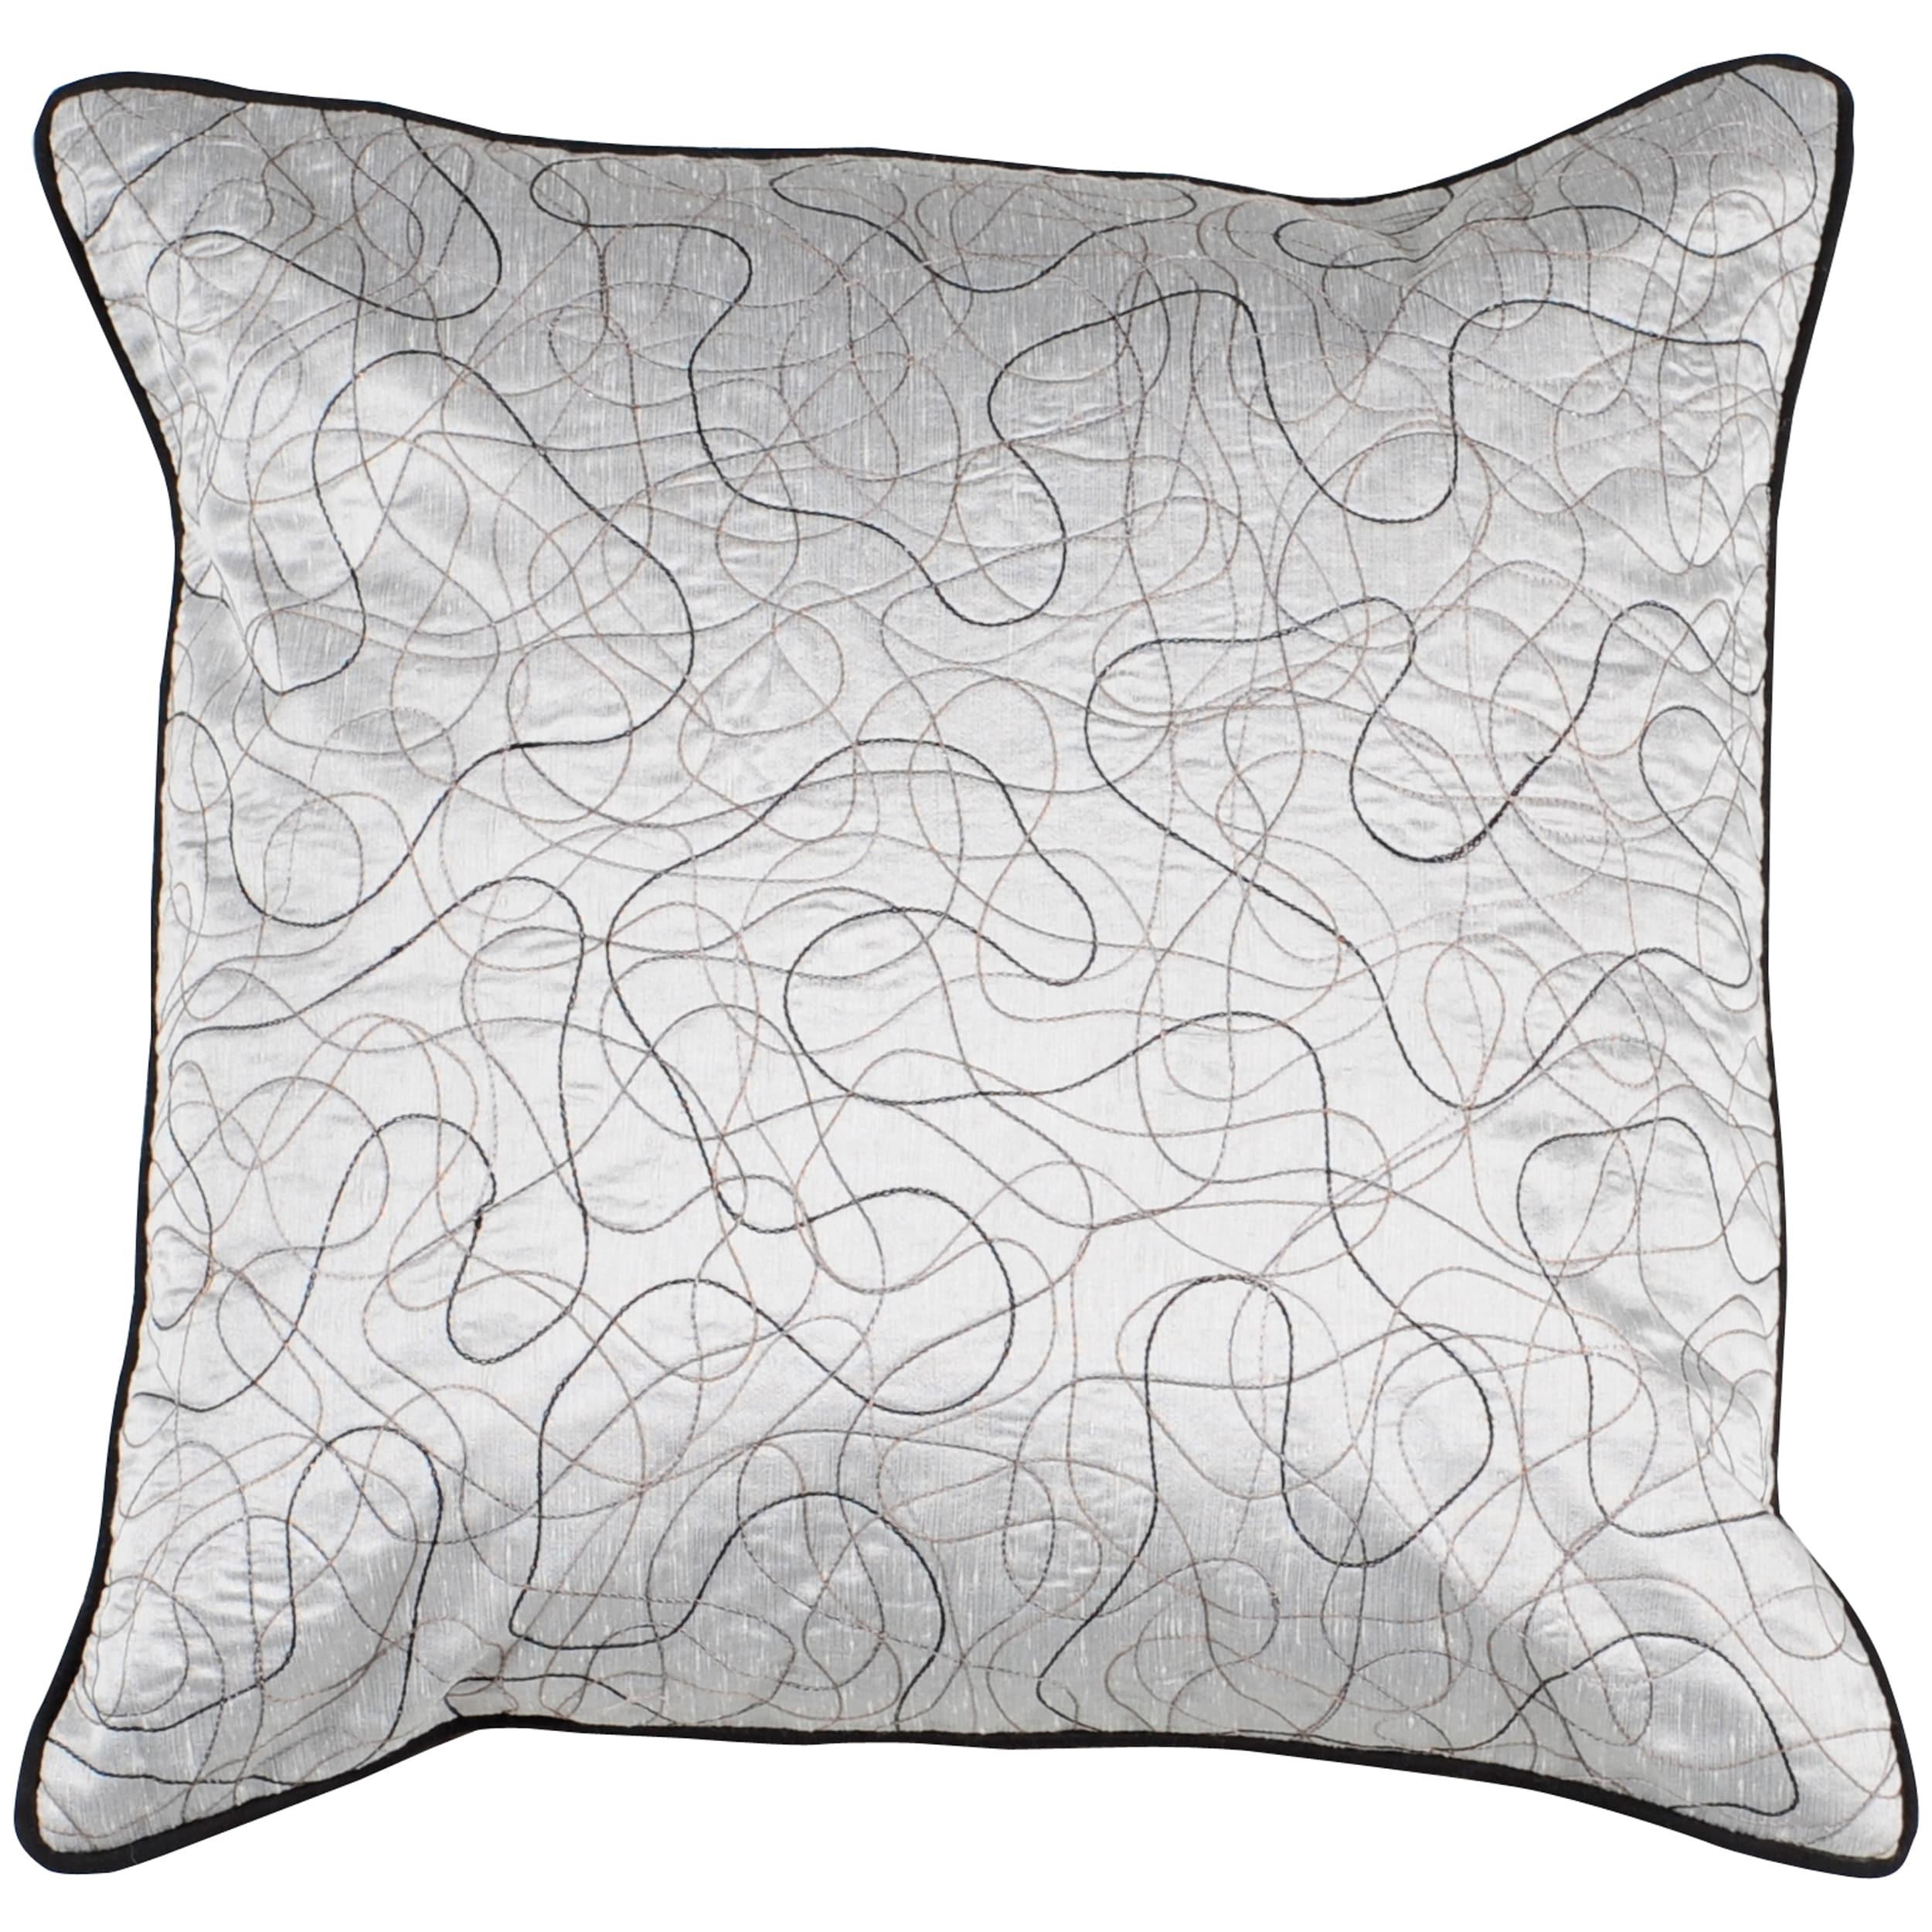 Decorative Topstitched Pro 18x18 Pillow